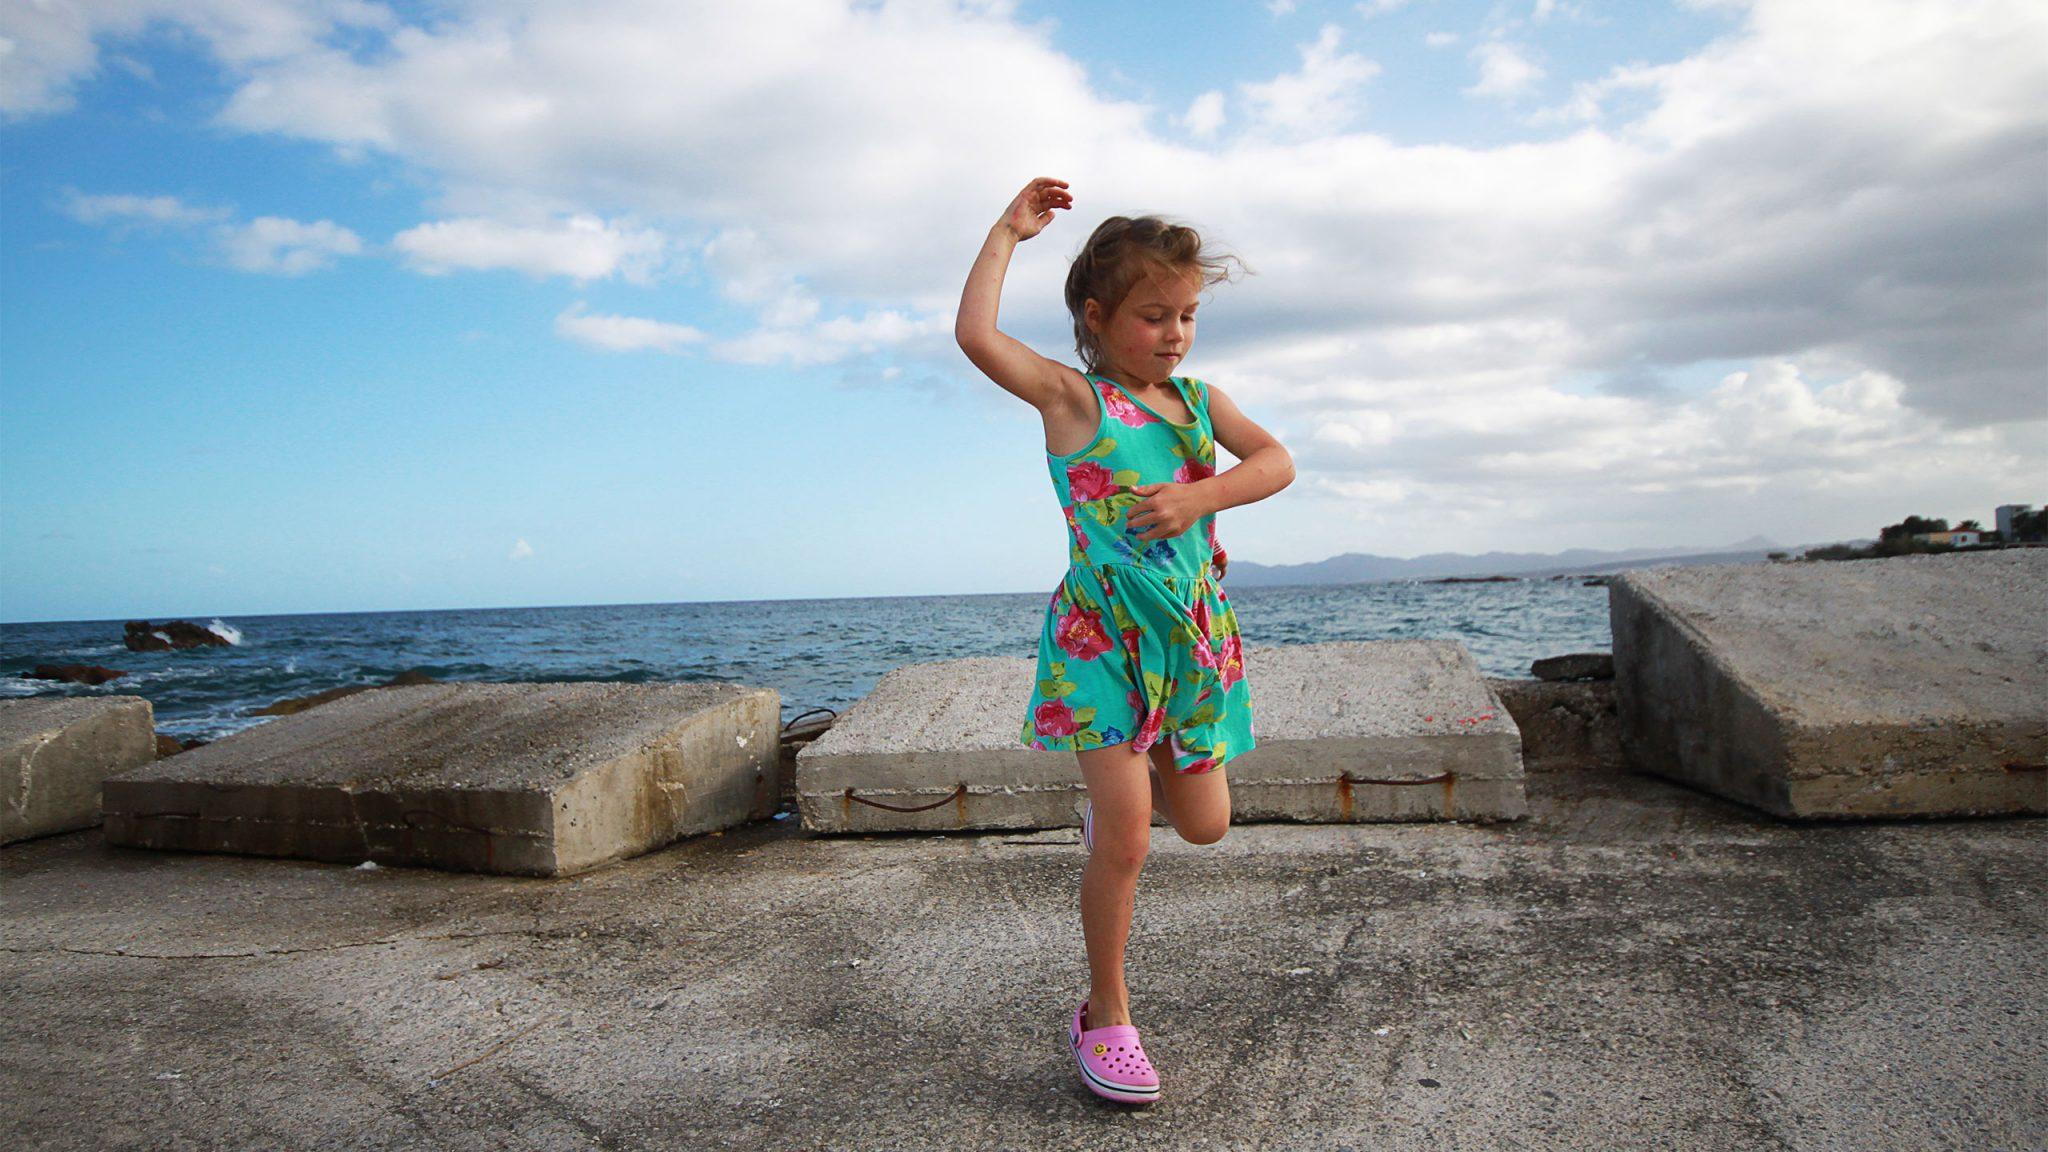 Crete Greek islands. The joy of Crete never fails to start a dancing frenzy.